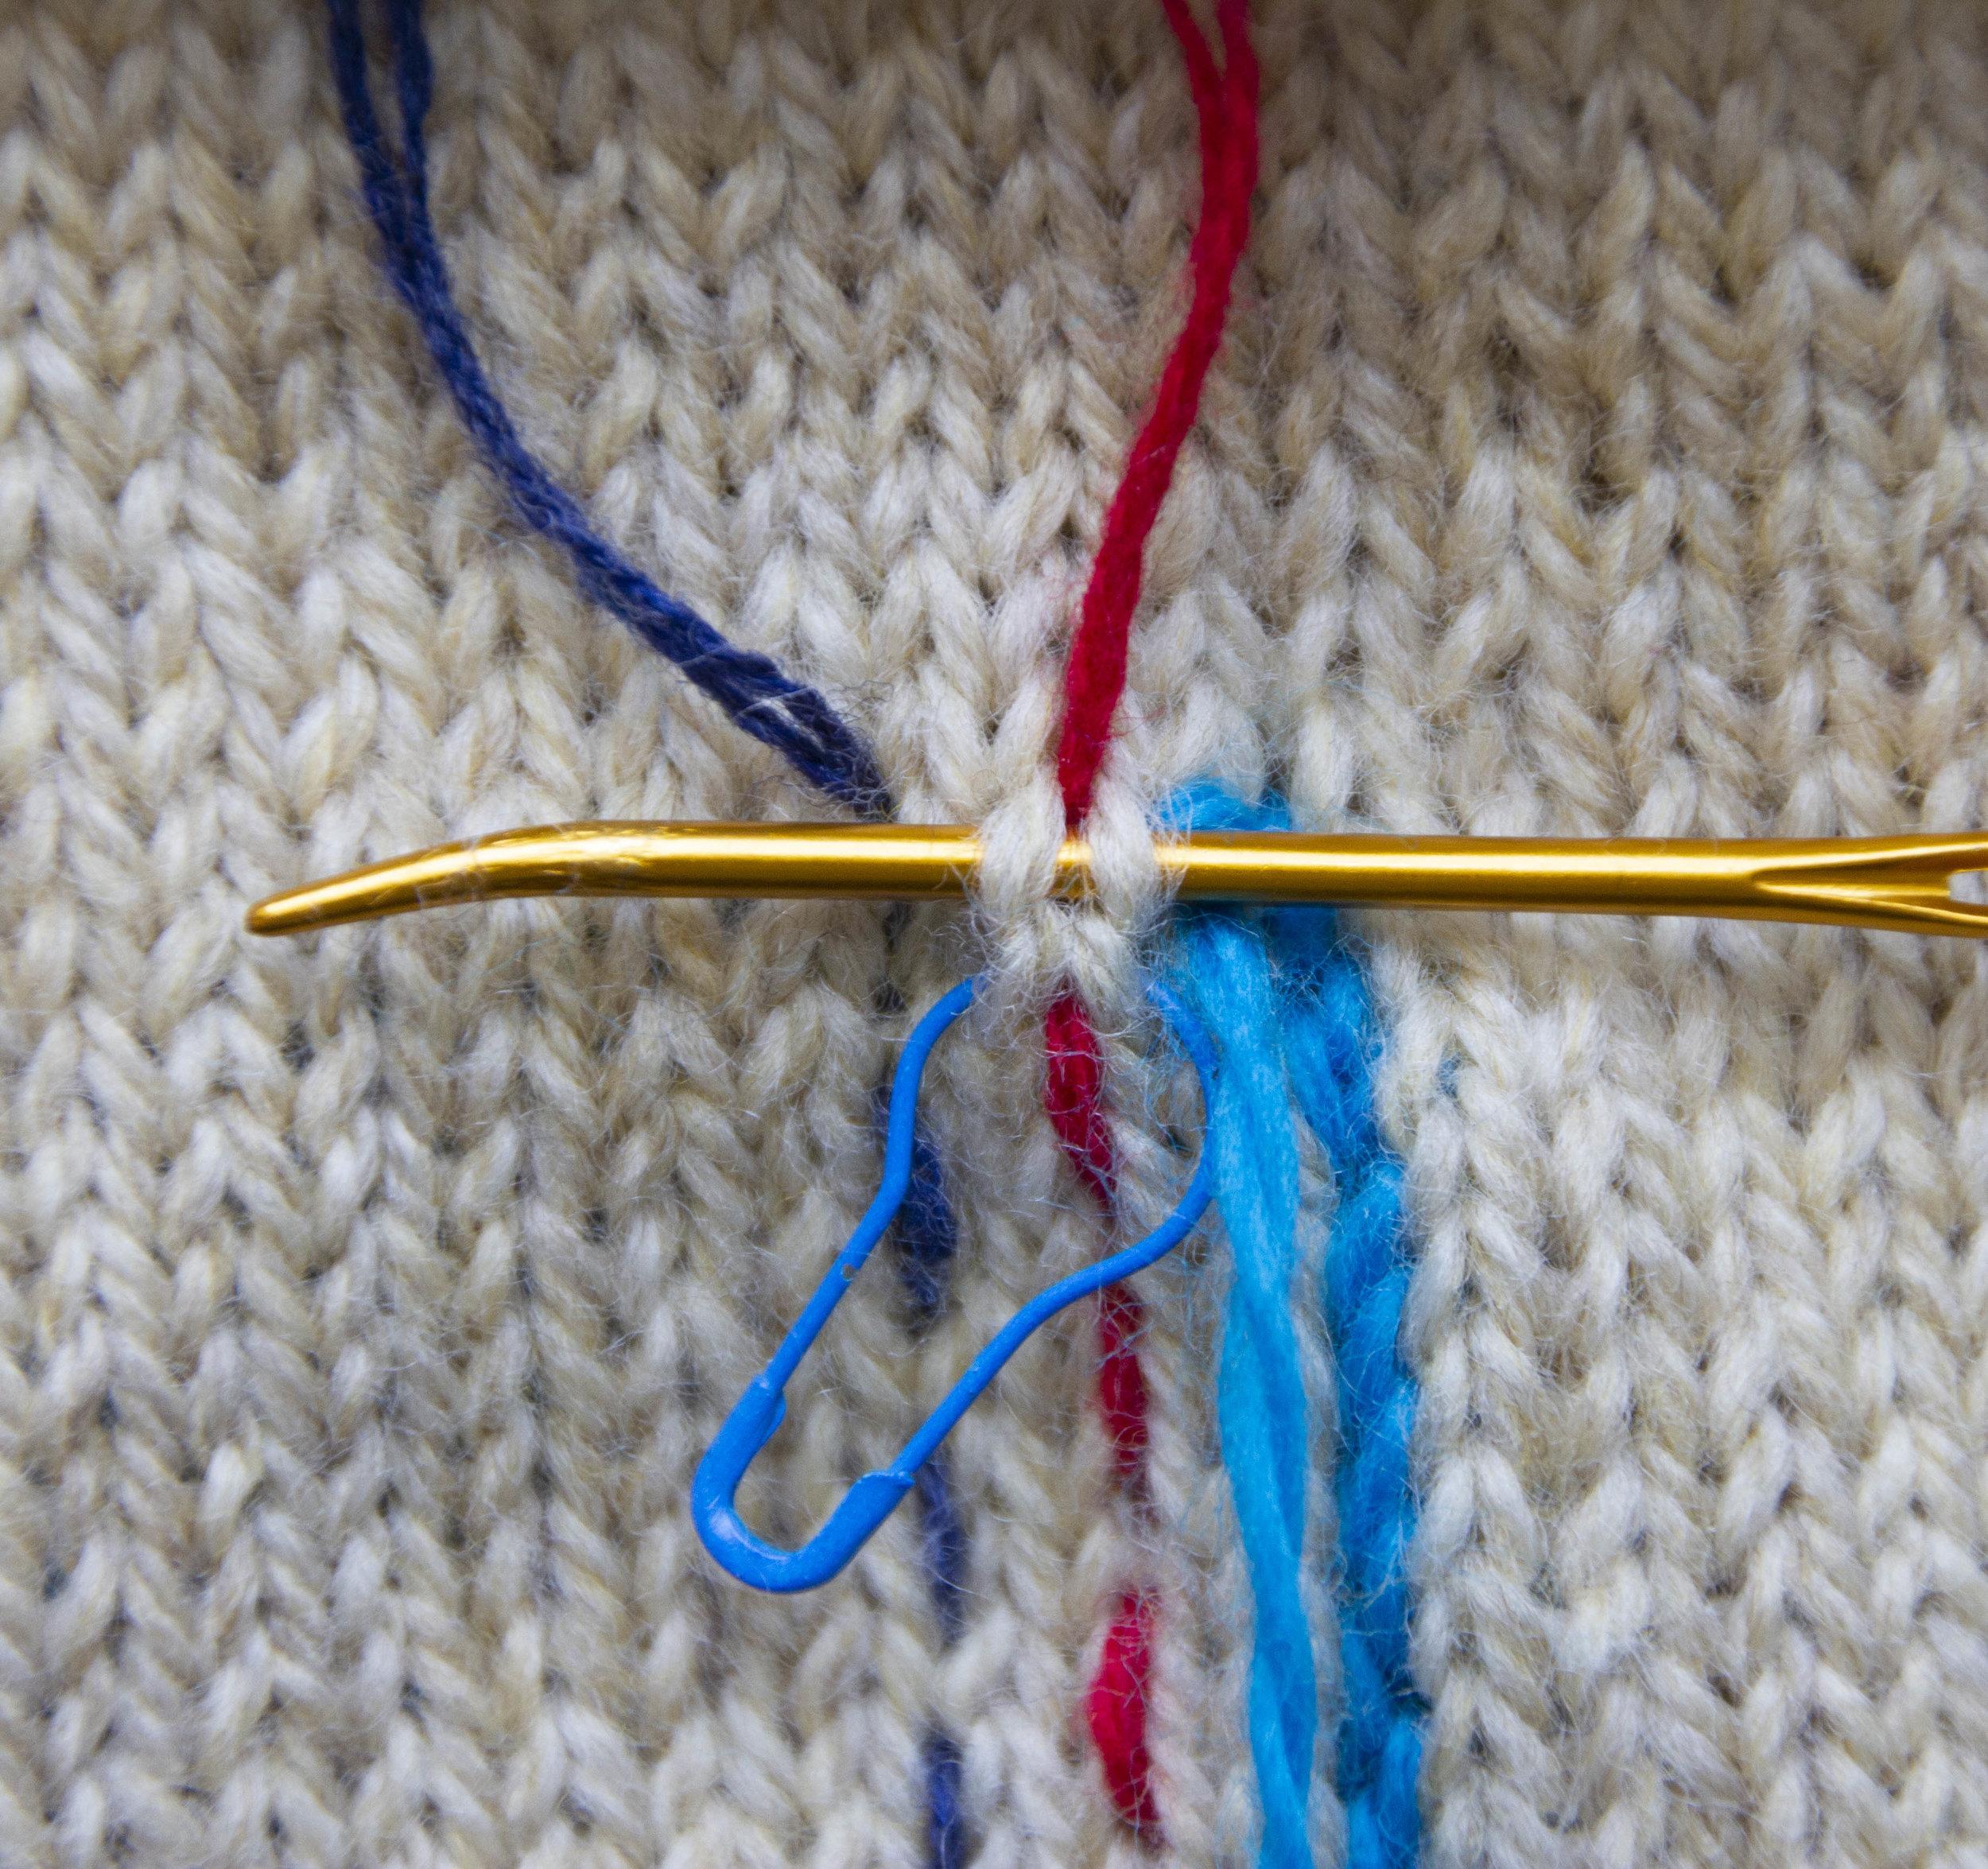 merele back stitch steek 21.jpg